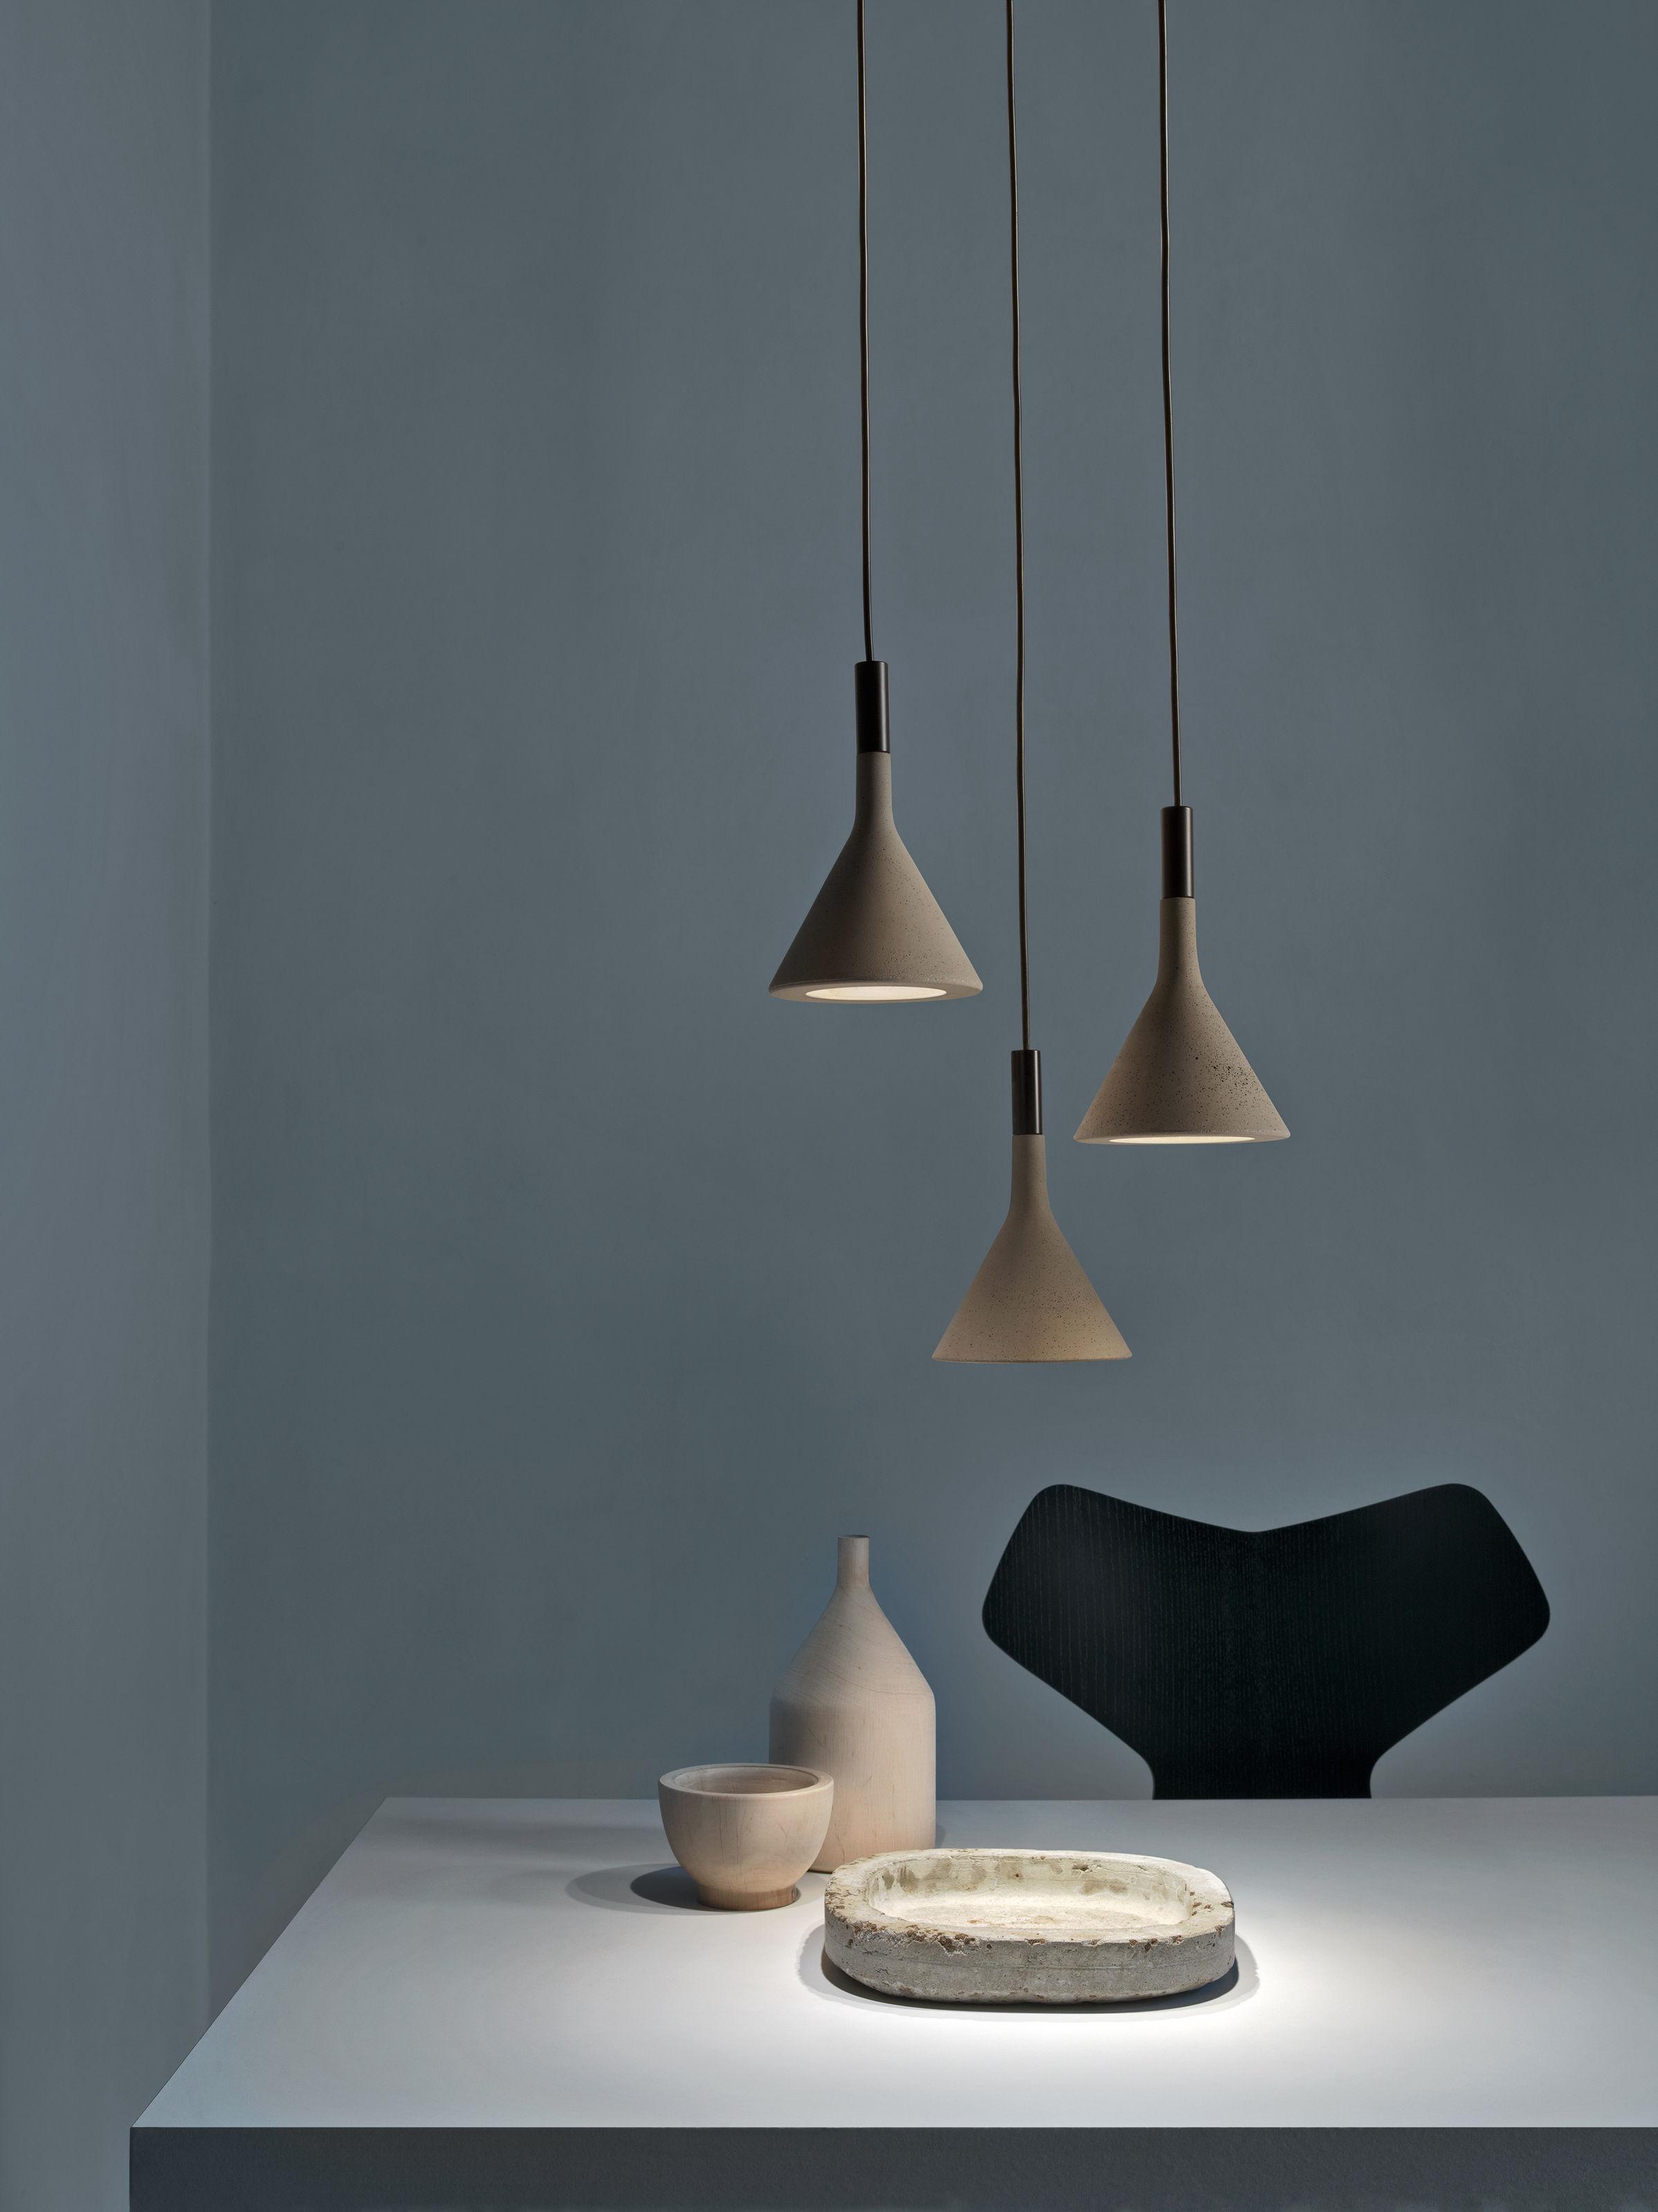 mini aplomb beton h 21 cm foscarini pendelleuchte. Black Bedroom Furniture Sets. Home Design Ideas